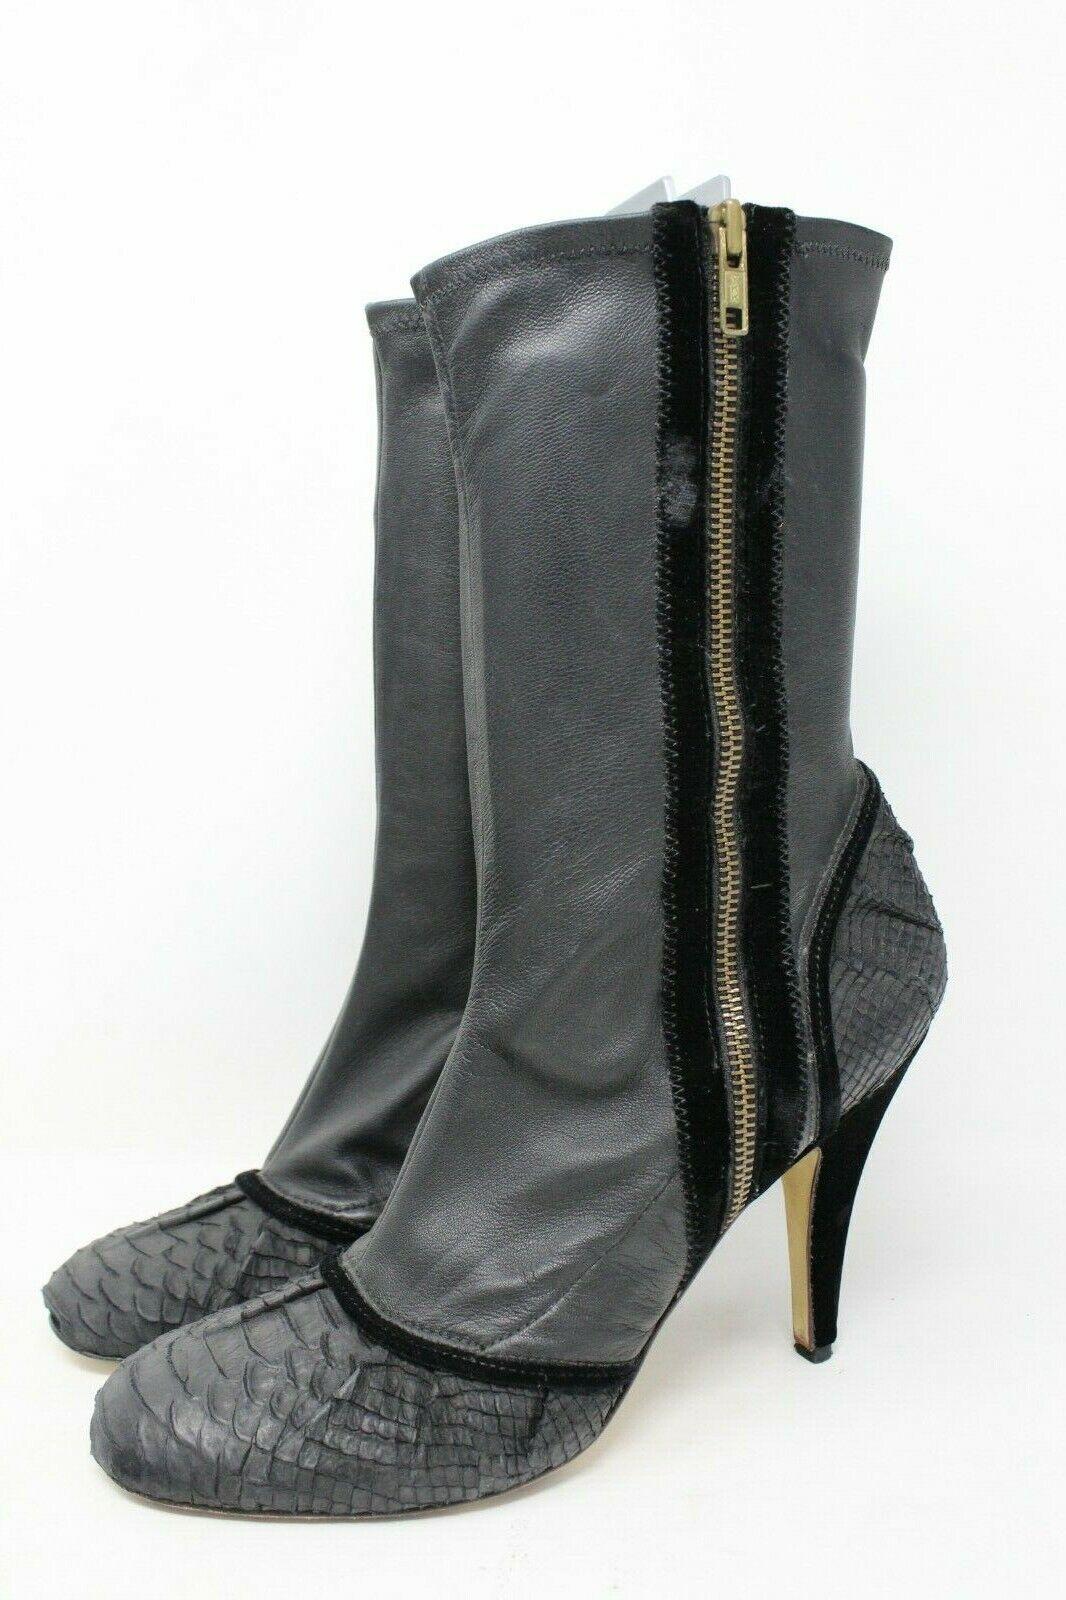 BCBGMAXAZRIA Leather Velvet Trim Cap Toe Ankle Boot Black gold - 9 US NEW